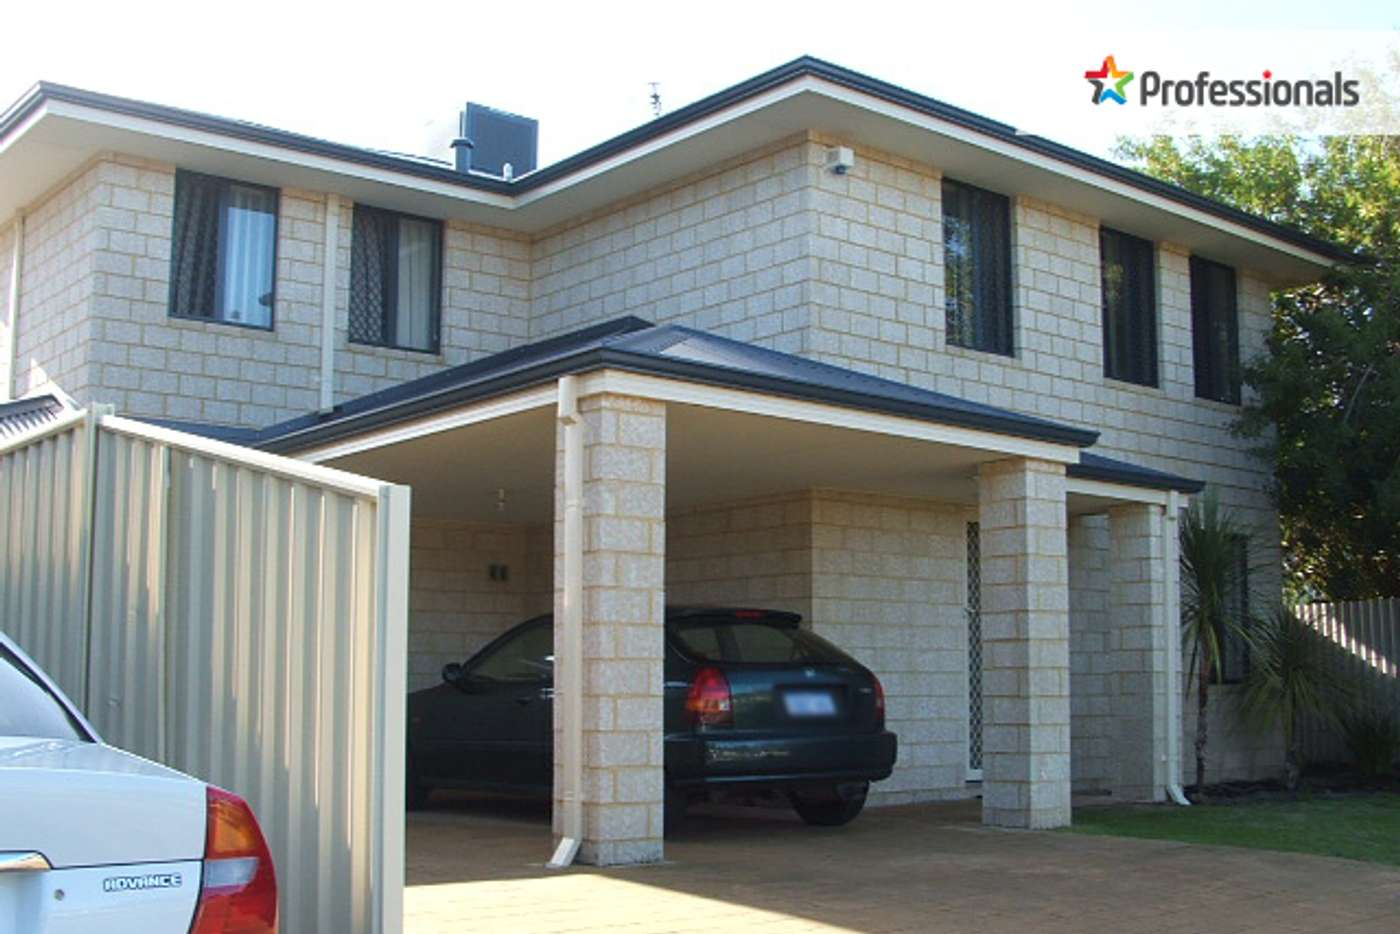 Main view of Homely semiDetached listing, 2b Mckay Street, Bentley WA 6102